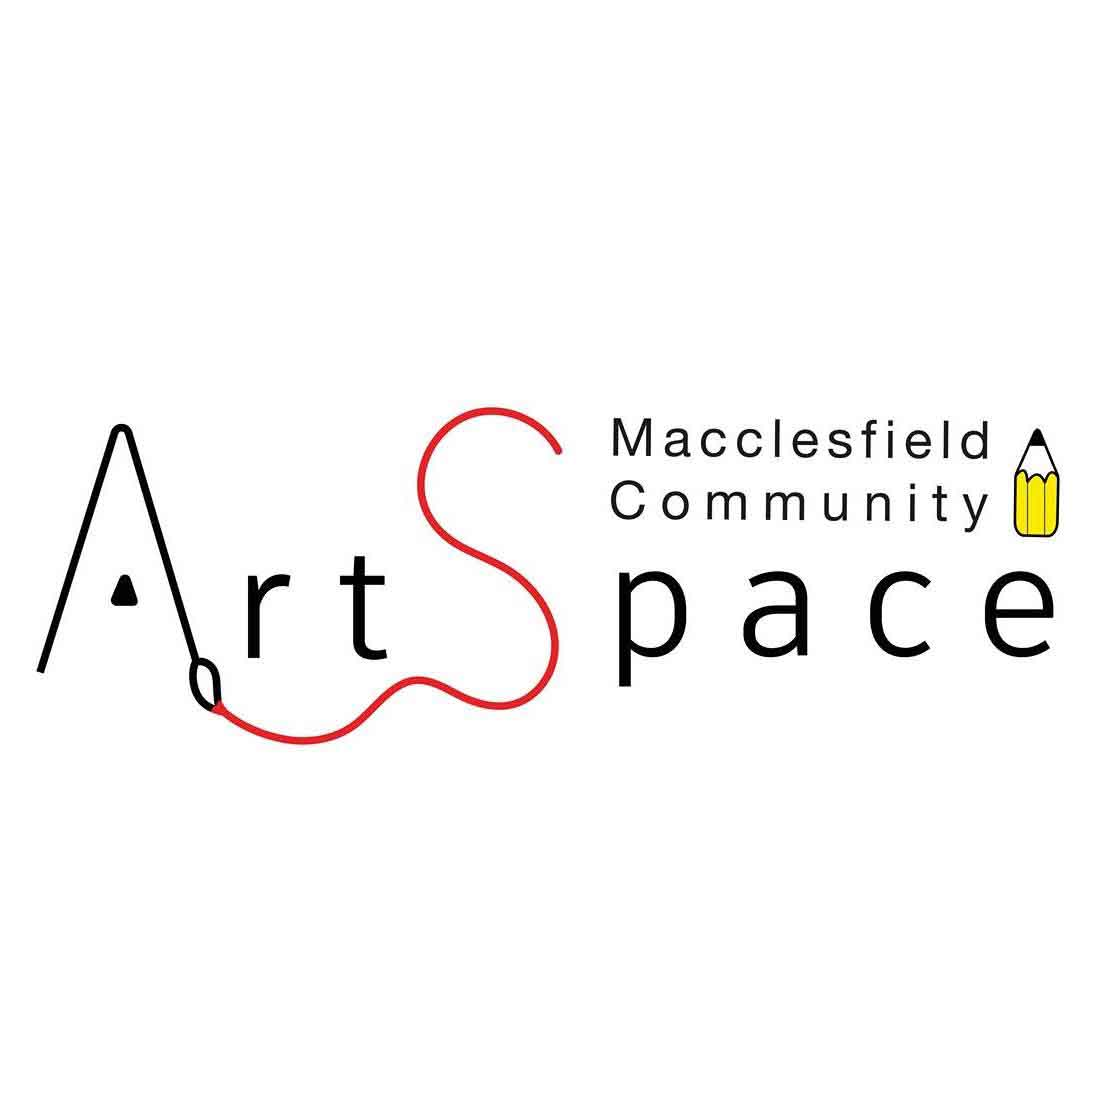 Macclesfield Community ArtSpace